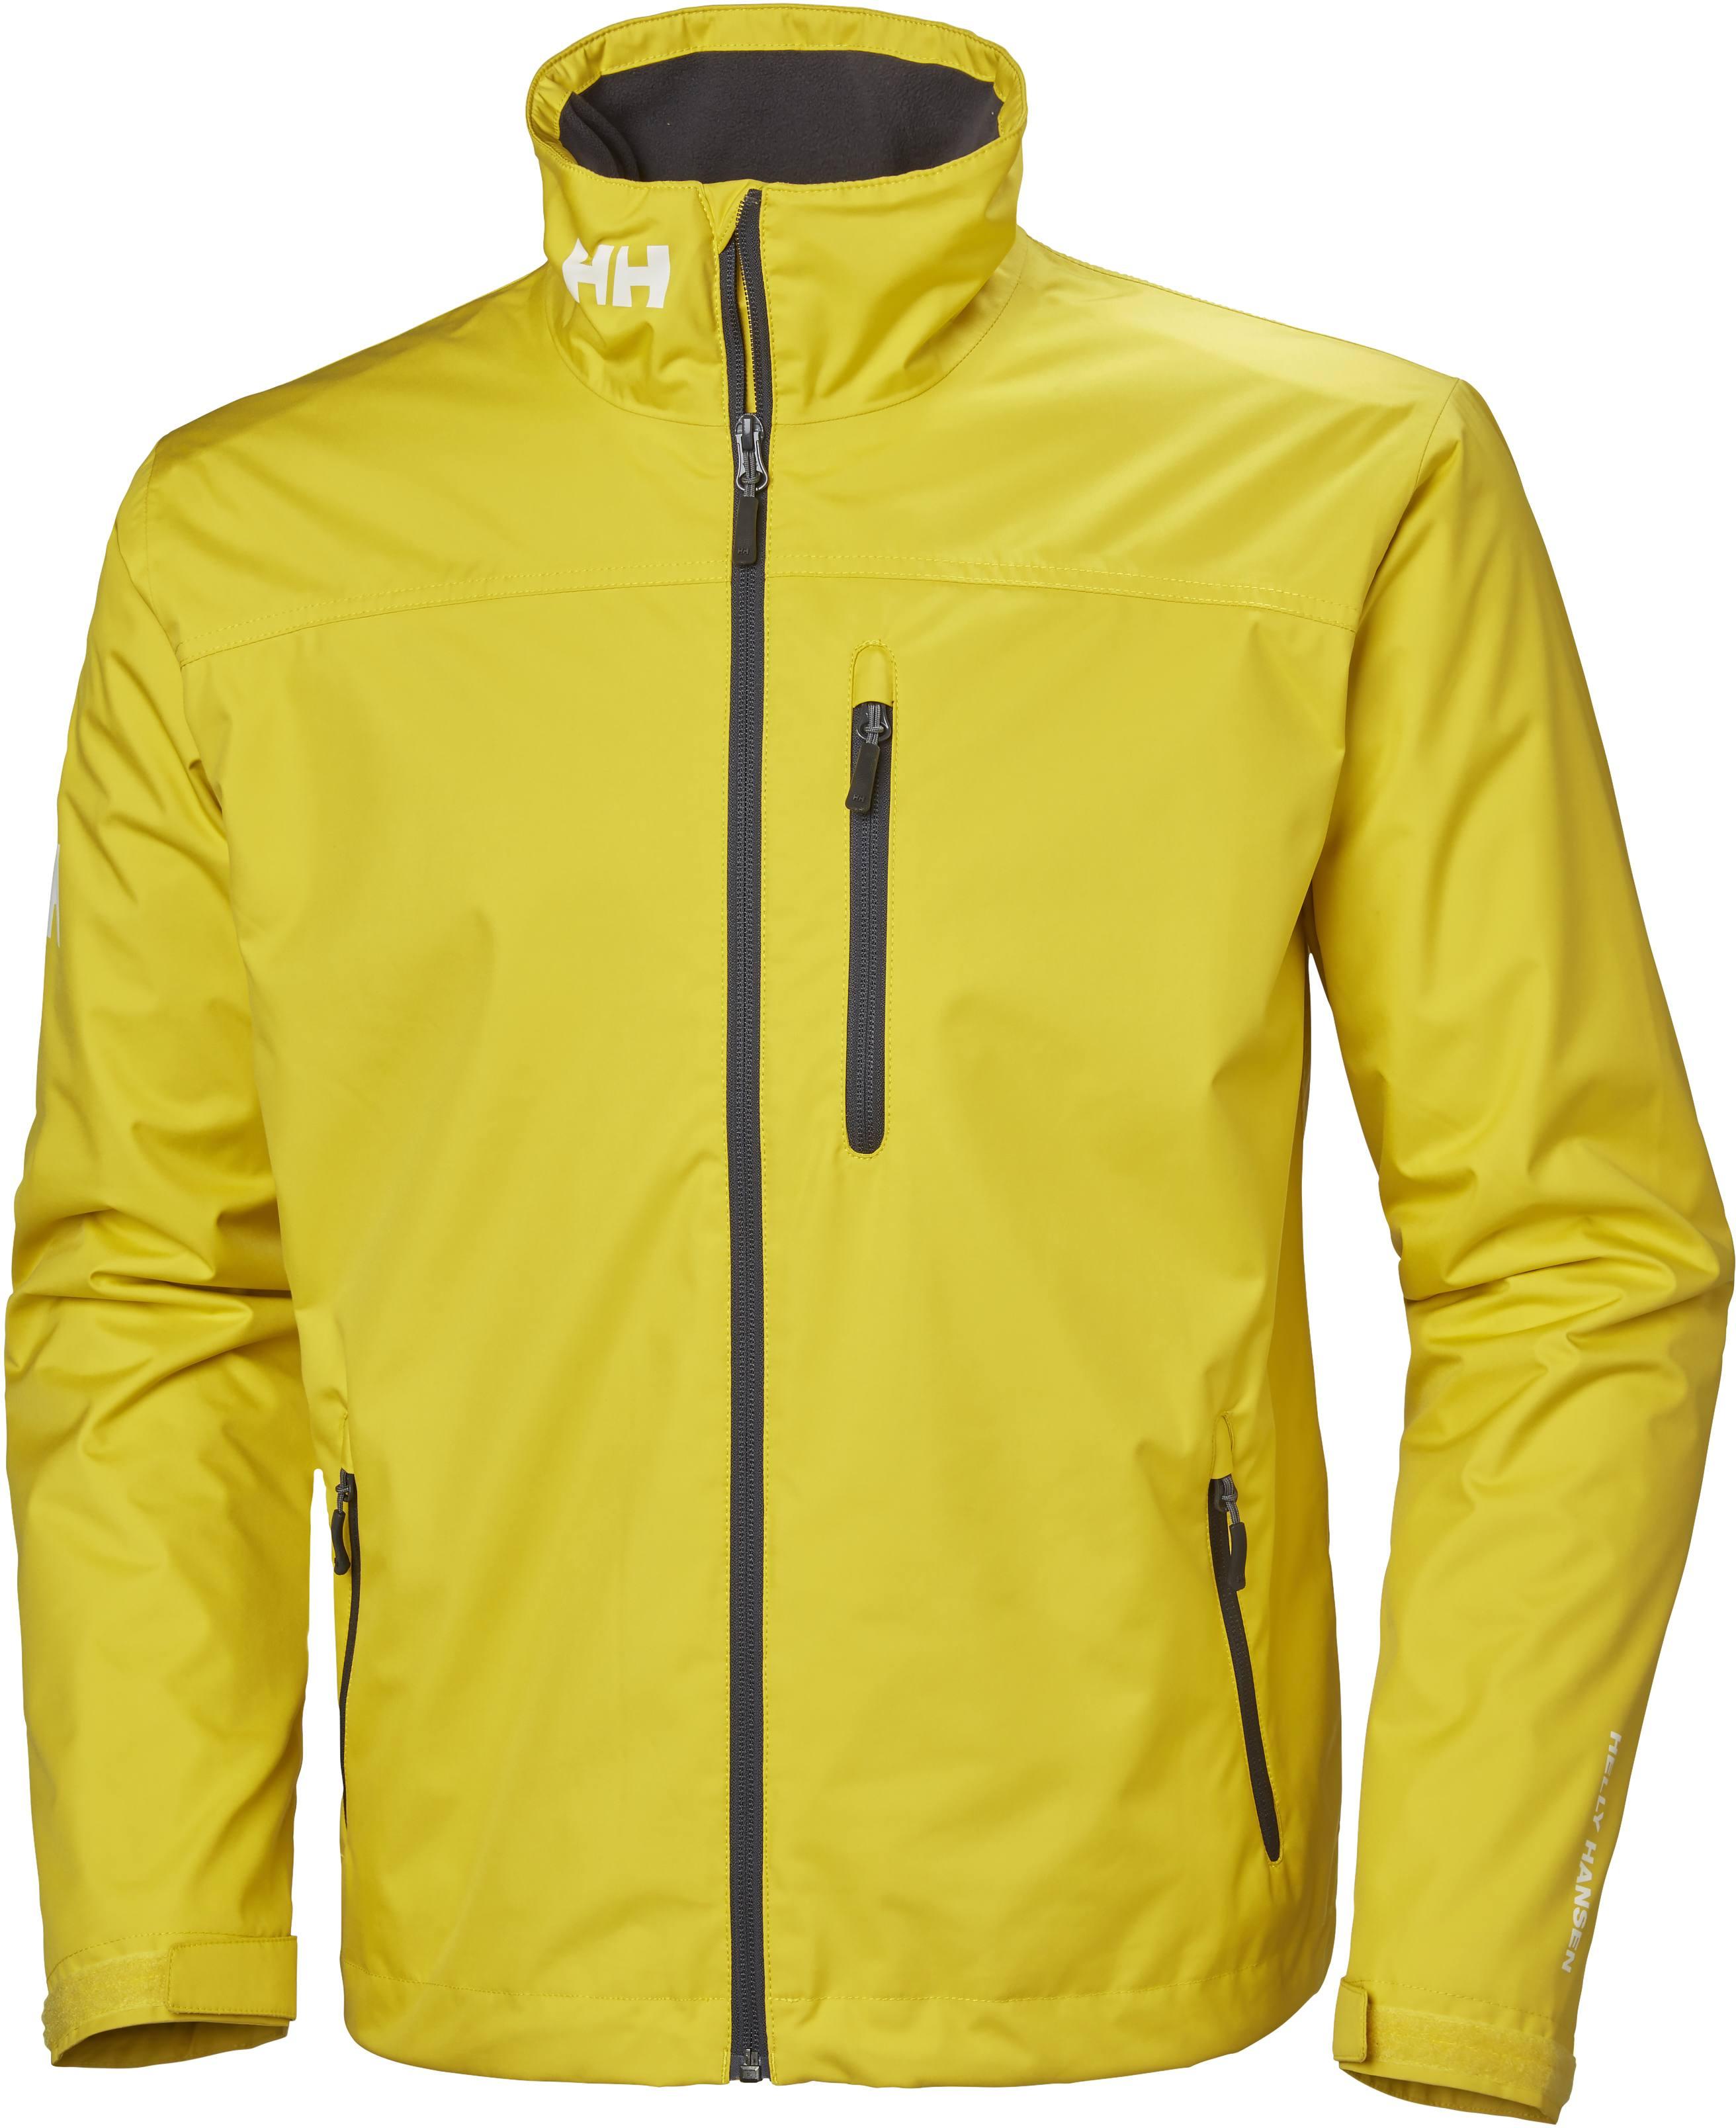 5c0489e6e84 Helly Hansen Crew Midlayer Jacket | Scandinavian Outdoor